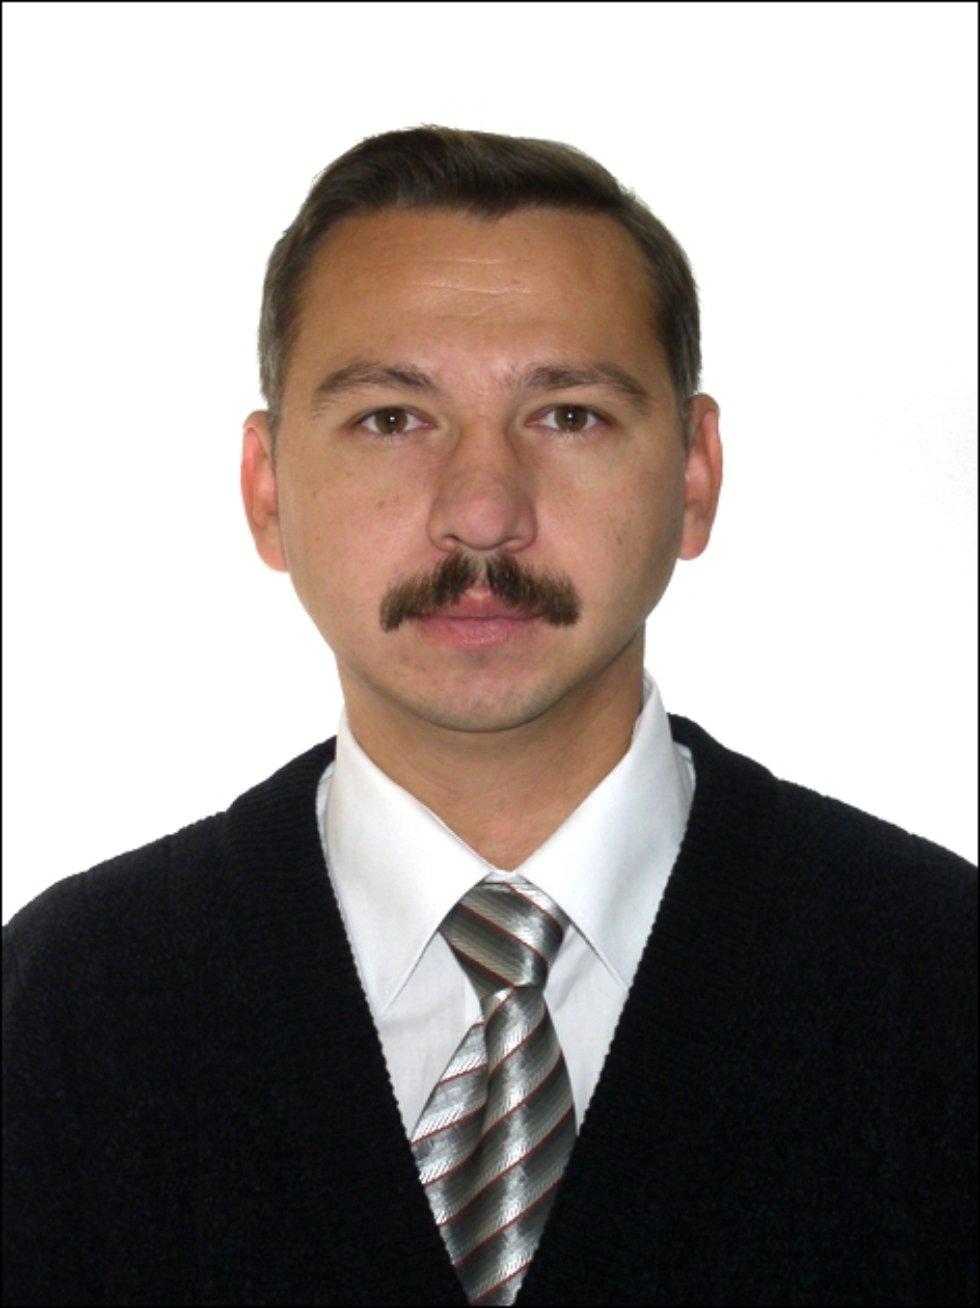 Королев Эдуард Анатольевич